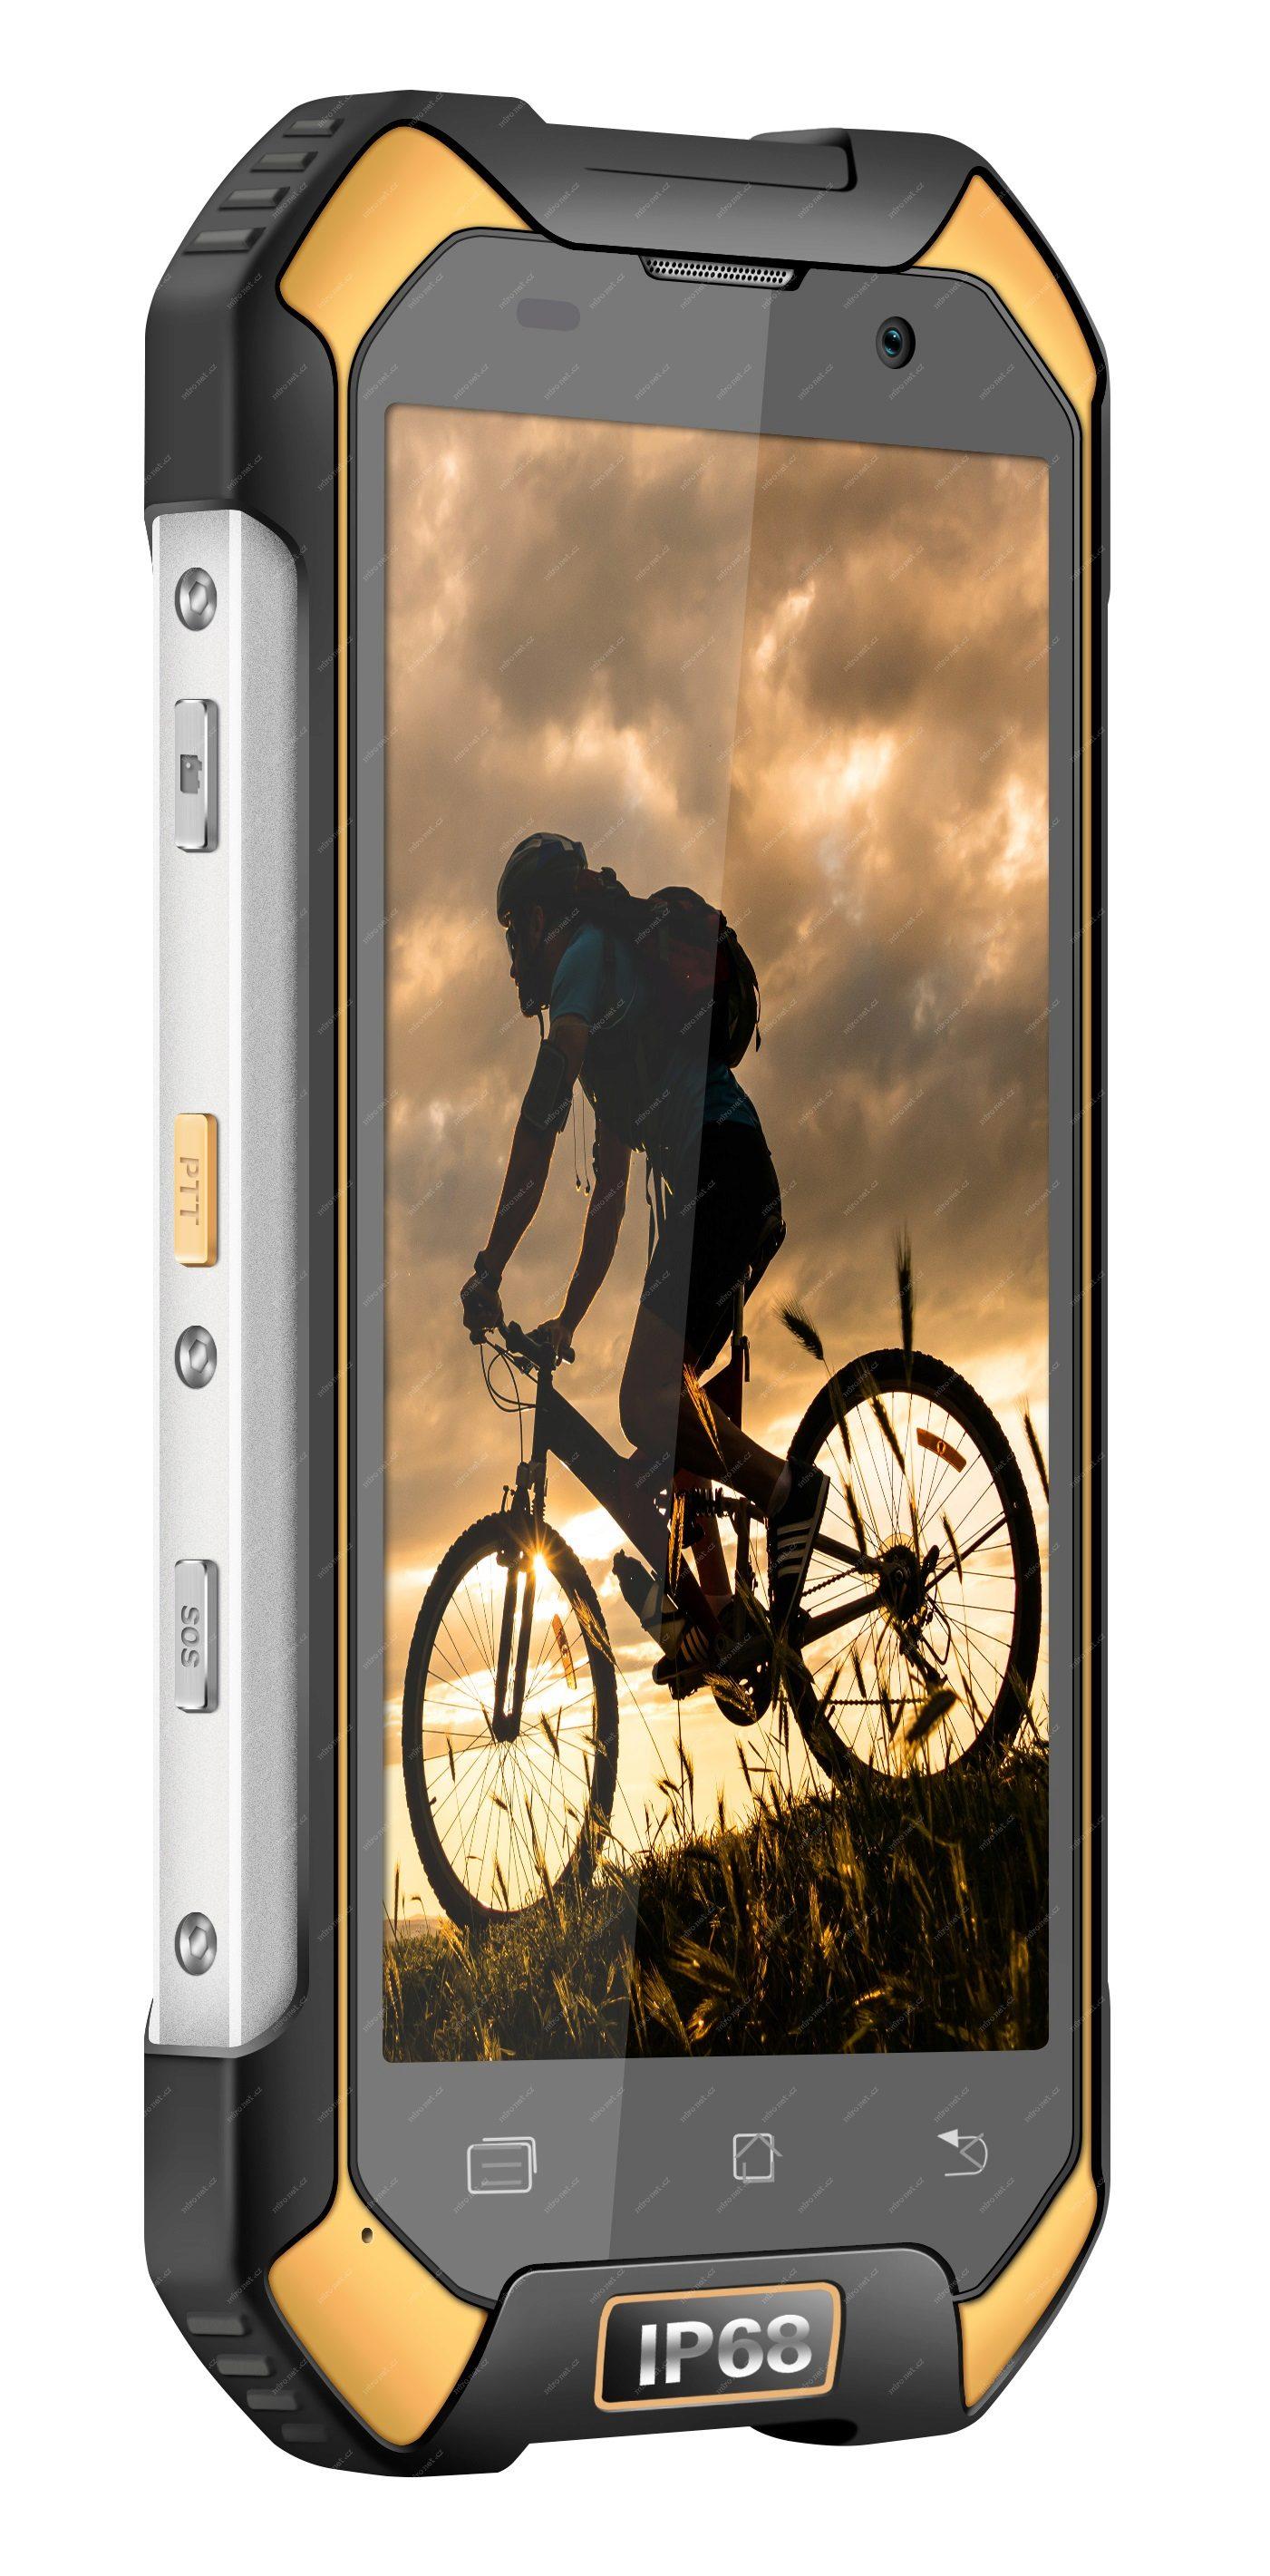 Mobilni Telefon Bazar Iget Blackview Bv6000s 4 7 Qu Mironet Cz